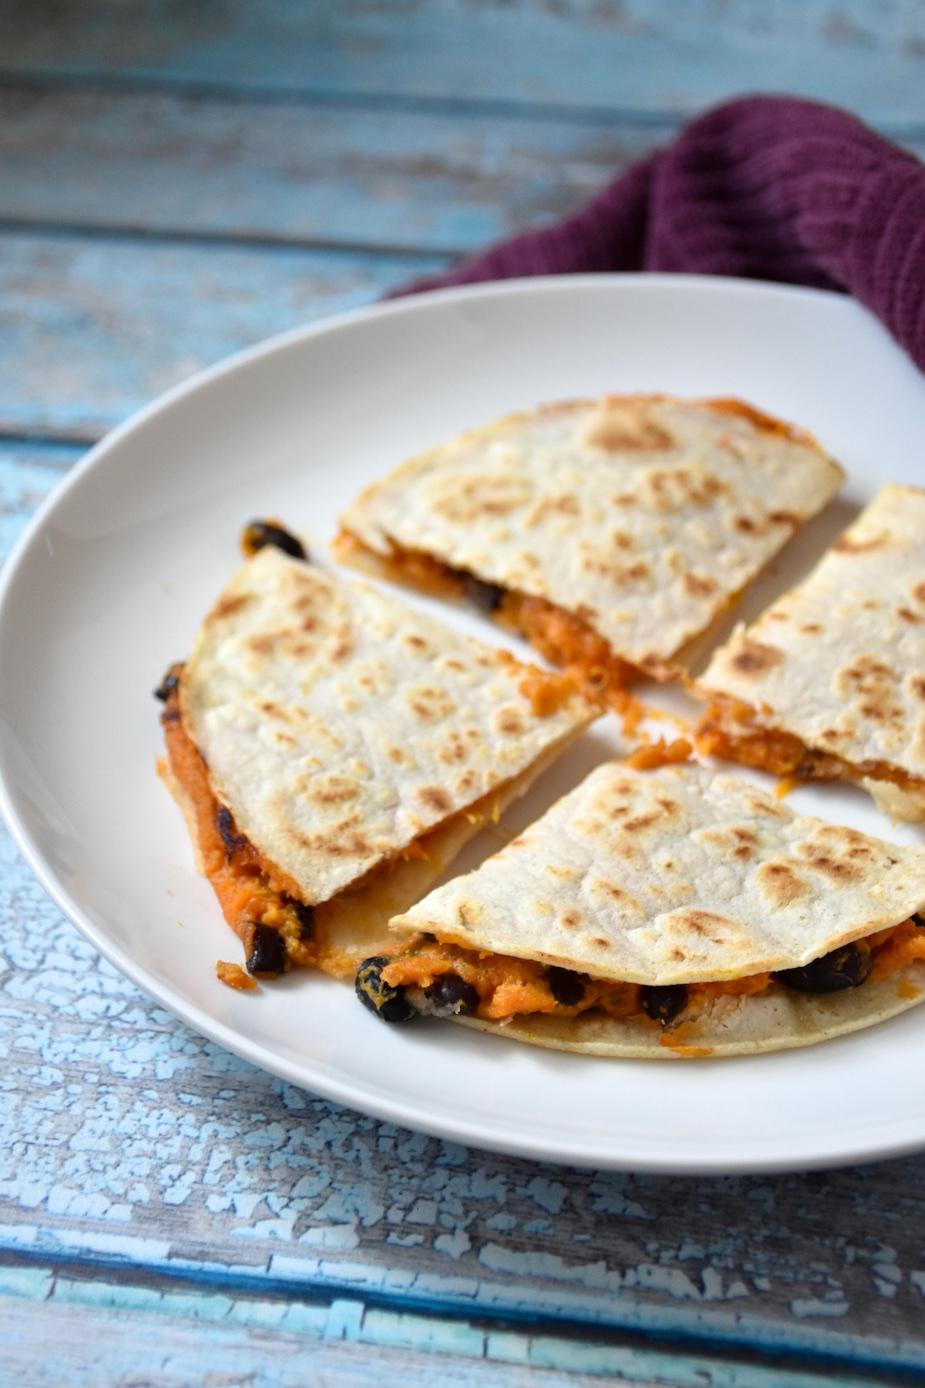 Gluten-free Dairy-free Sweet Potato & Black Bean Quesadilla